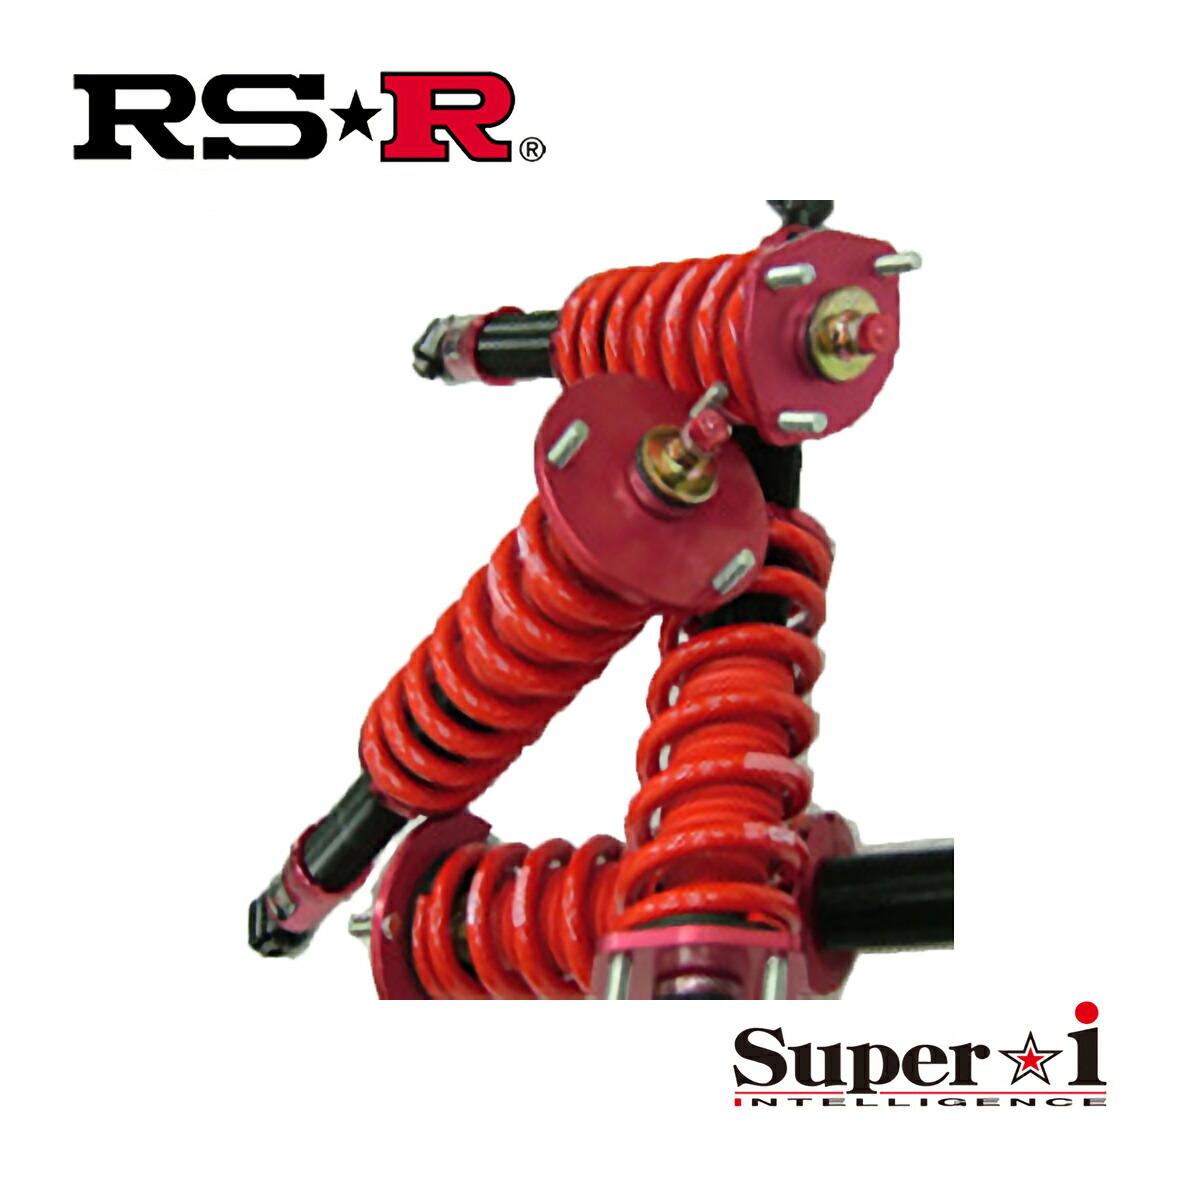 RS-R レクサス GYL26W RX450hL 車高調 リア車高調整: ネジ式 SIT296M スーパーi RSR 個人宅発送追金有